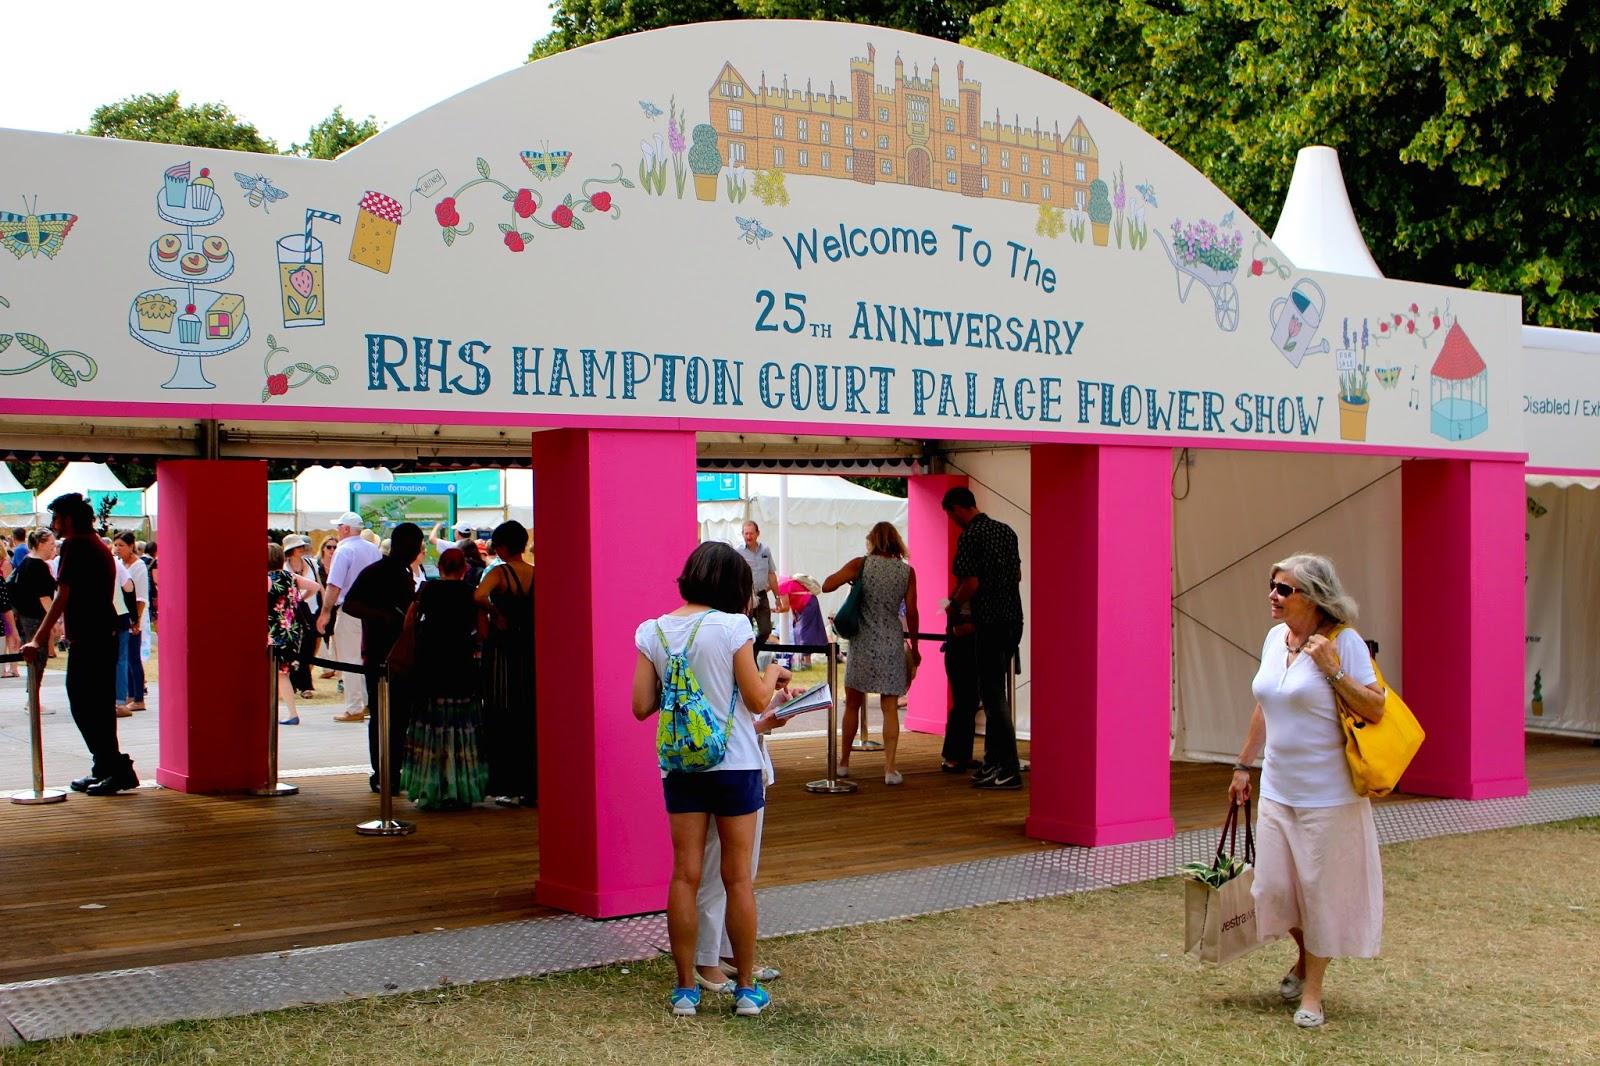 Hampton Court Palace Flower Show 2015 blog